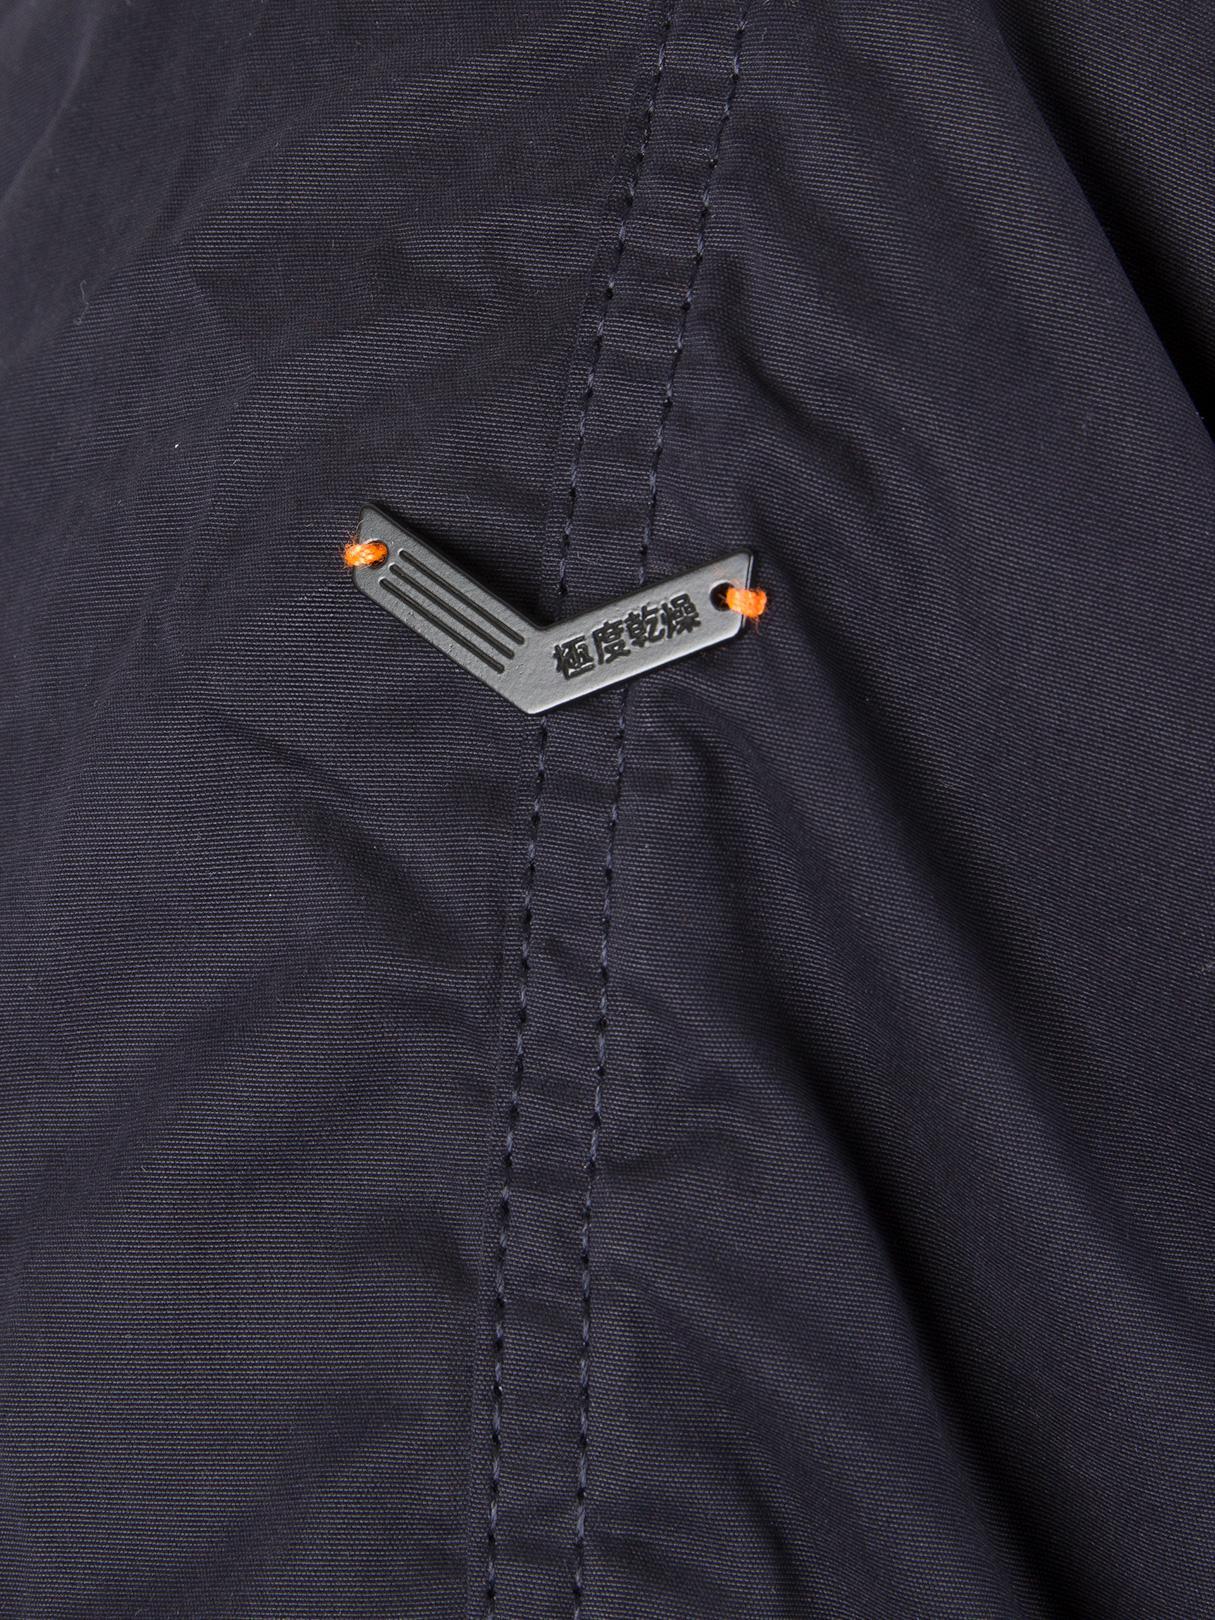 e23d4149ac6533 Superdry Dark Navy Sd-3 Parka Jacket in Blue for Men - Lyst